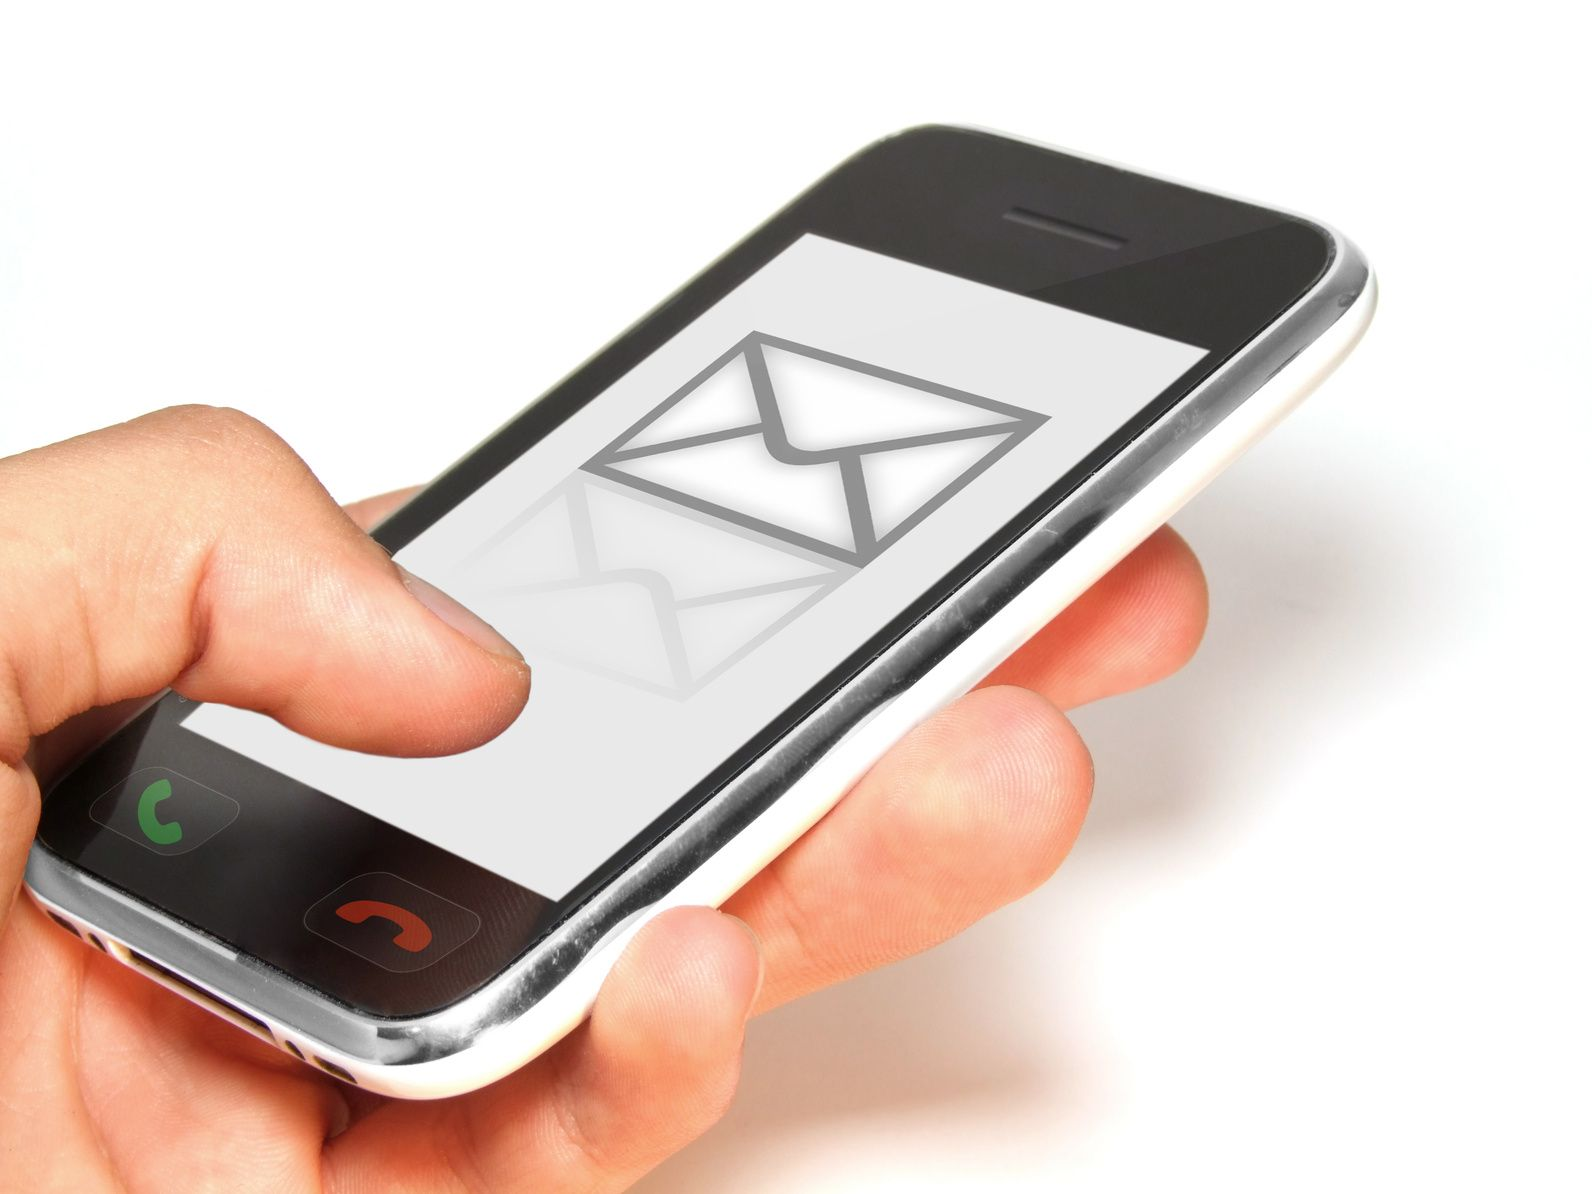 Ошибка 50 при отправке SMS Мегафон решаем за минуту